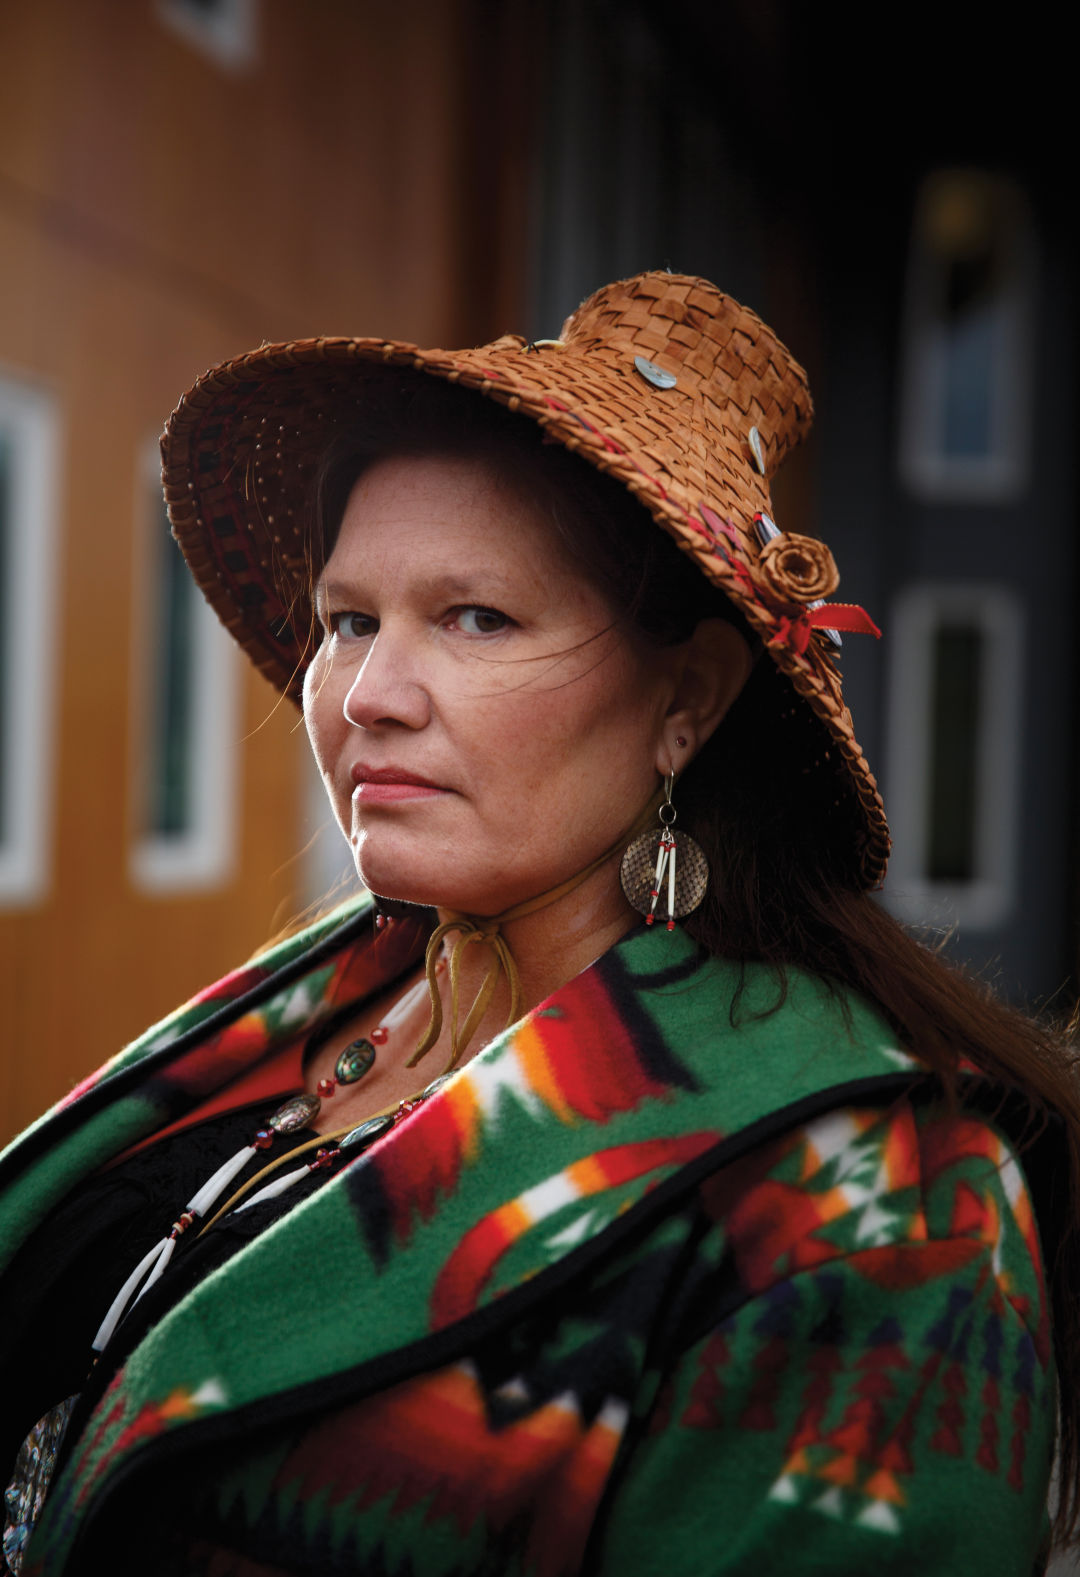 Women Erased: How Washington Has Failed Missing Native Women